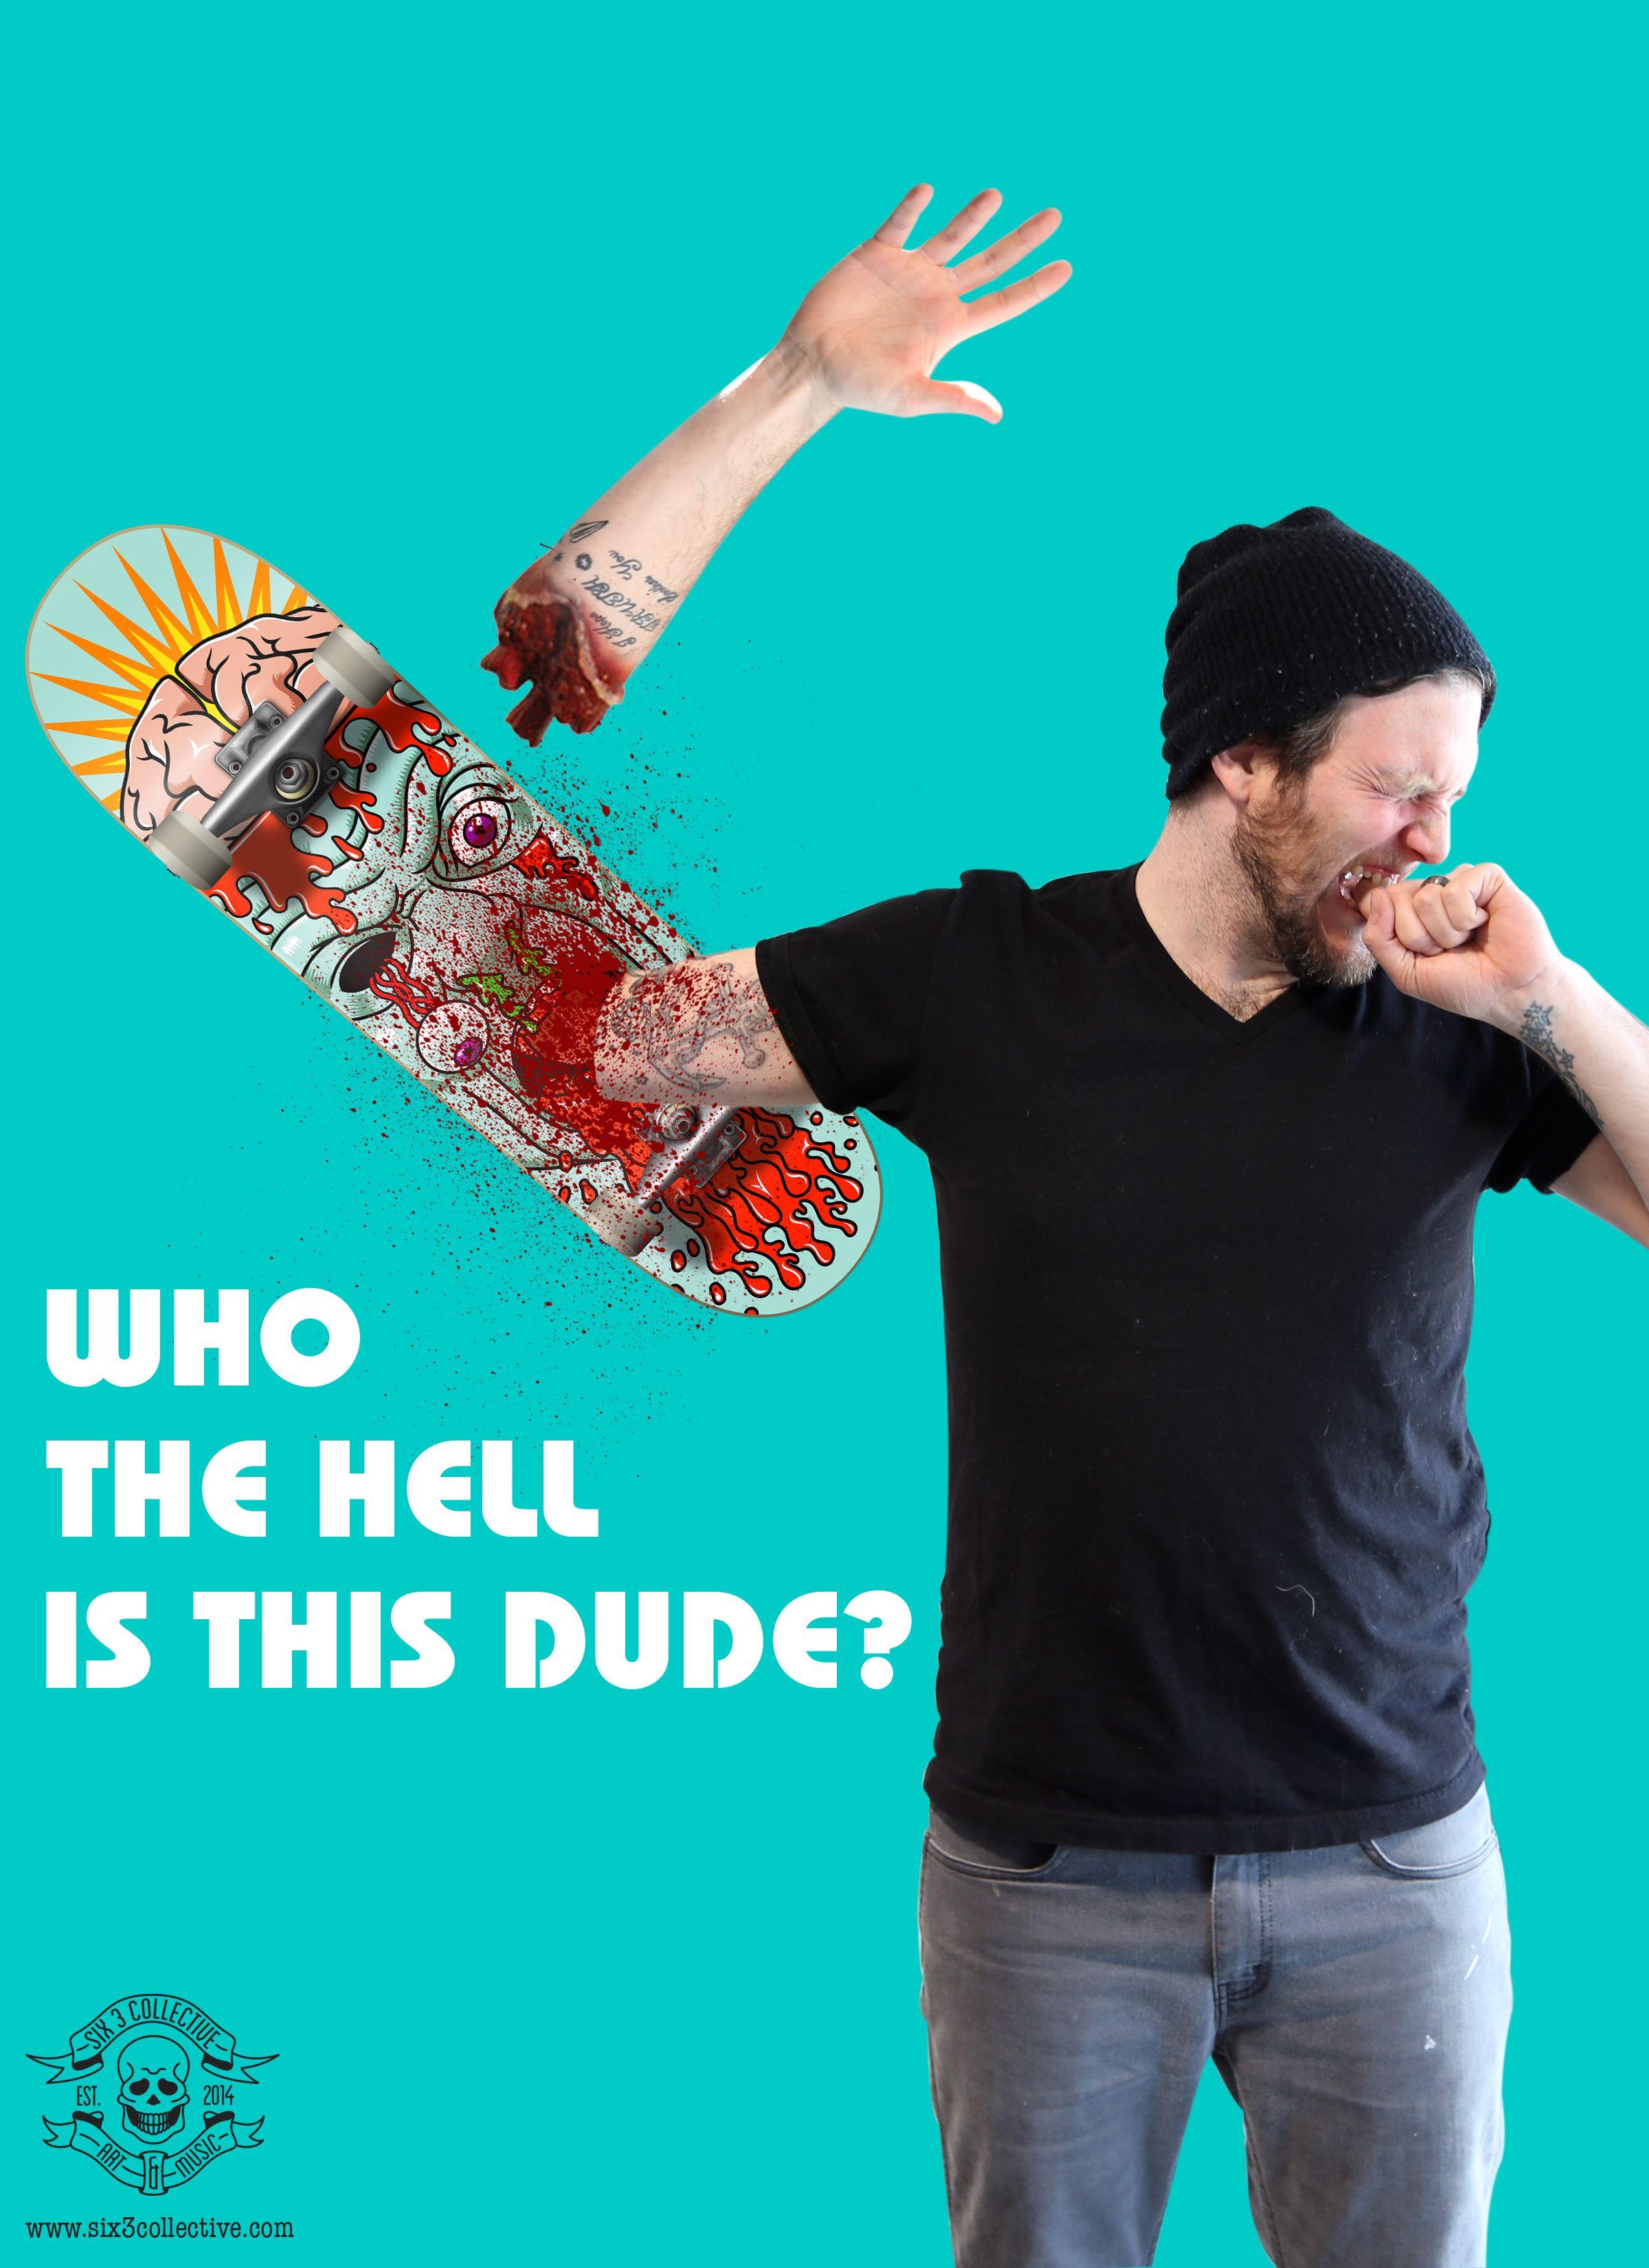 New Skate Decks Available Now at shop.six3collective.com #skateboards #horror #vampire #advertising #thrasher #skateordie #sweetskateboards #gore